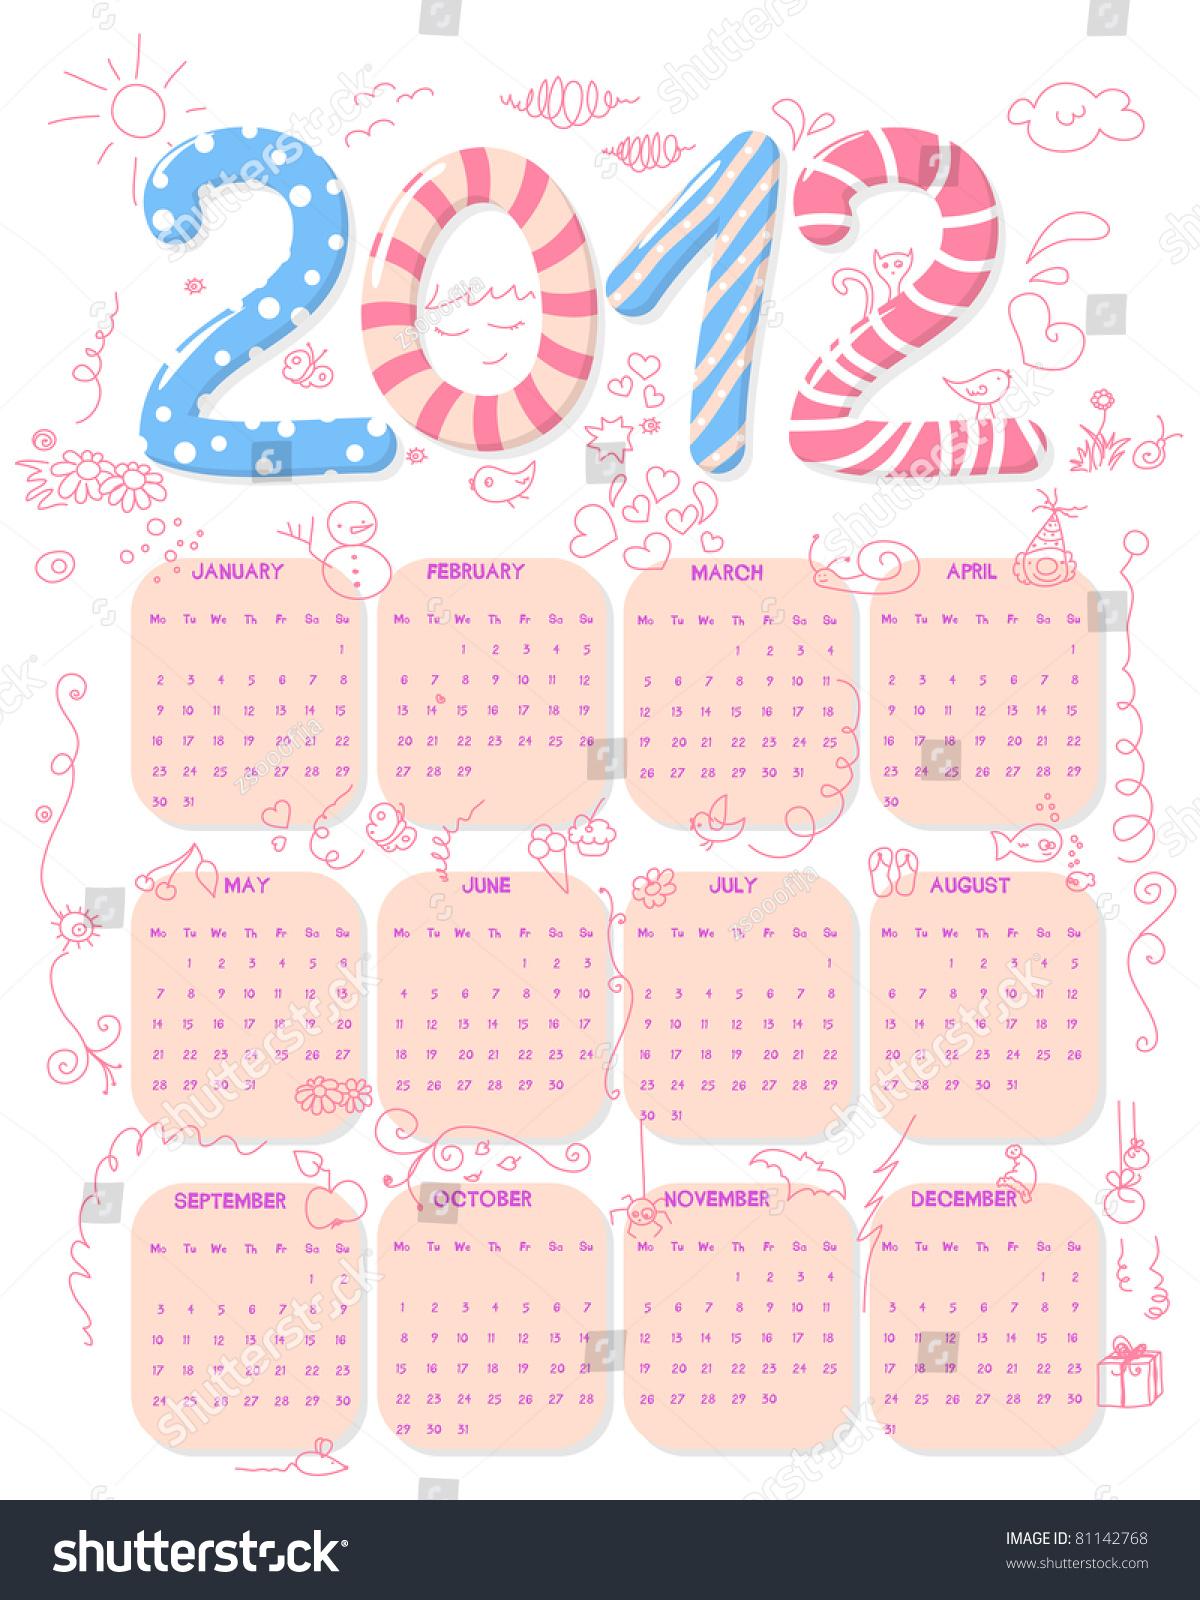 Calendar Girly : Cute girly calendar doodles week stock illustration